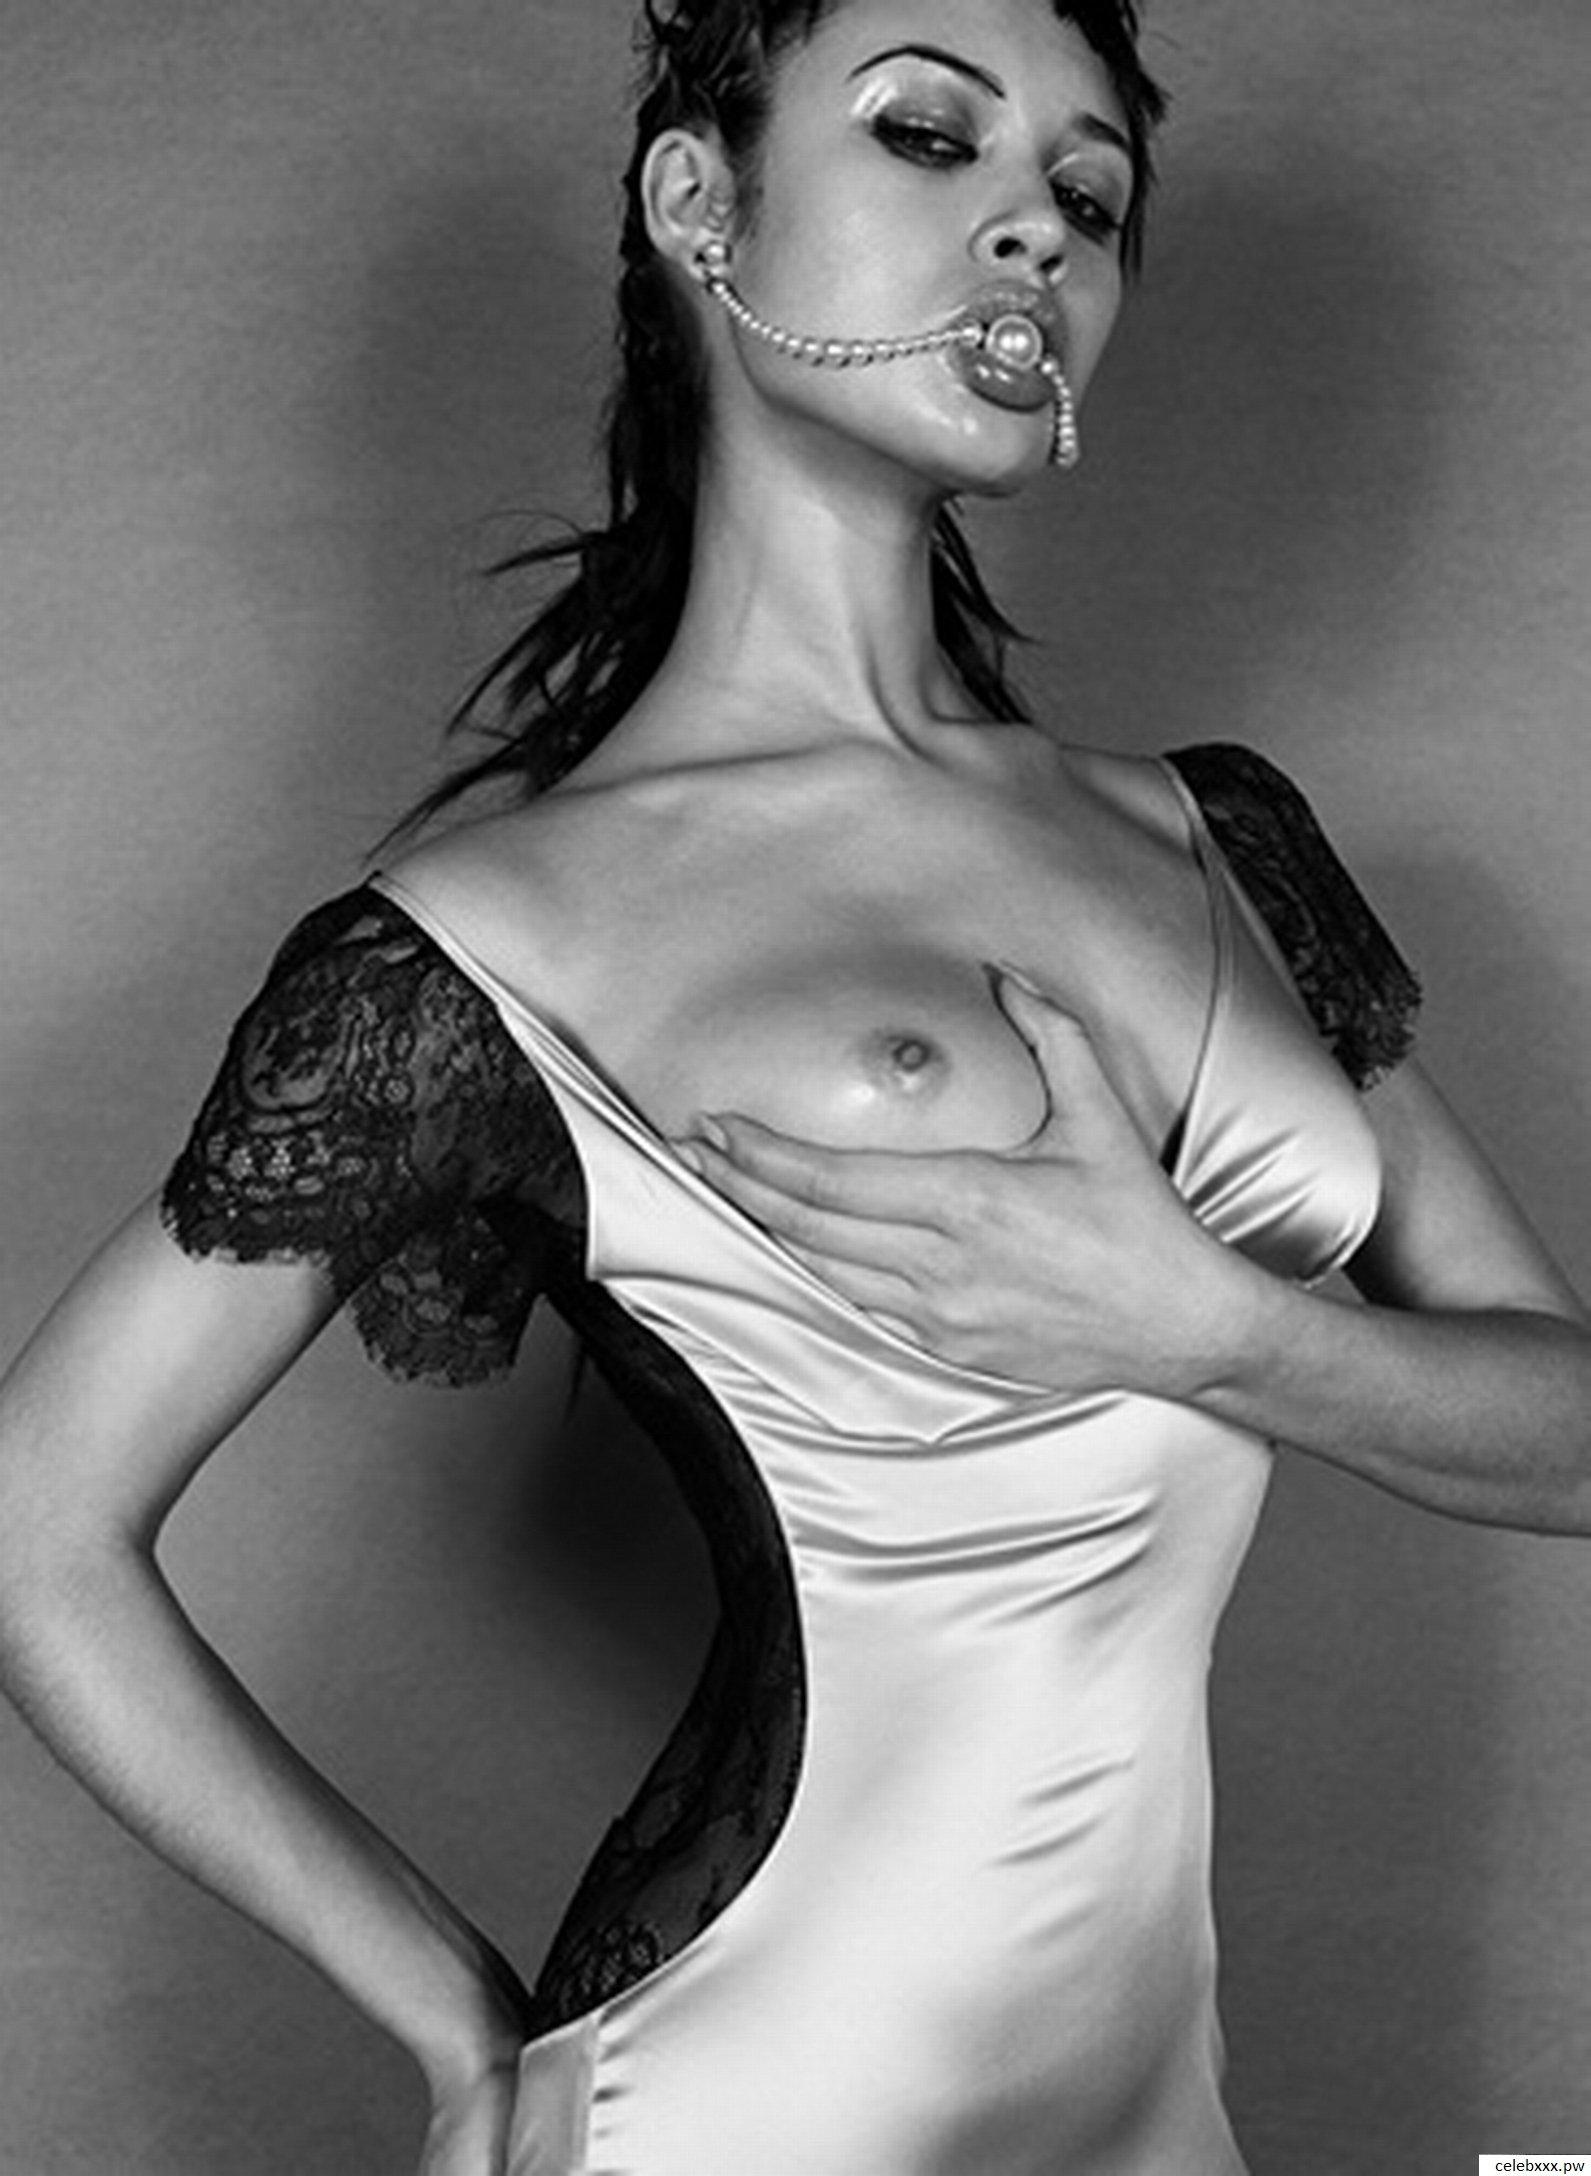 Olga Kurylenko Nudes Celebrity Leaked Nude Pictures Hacked